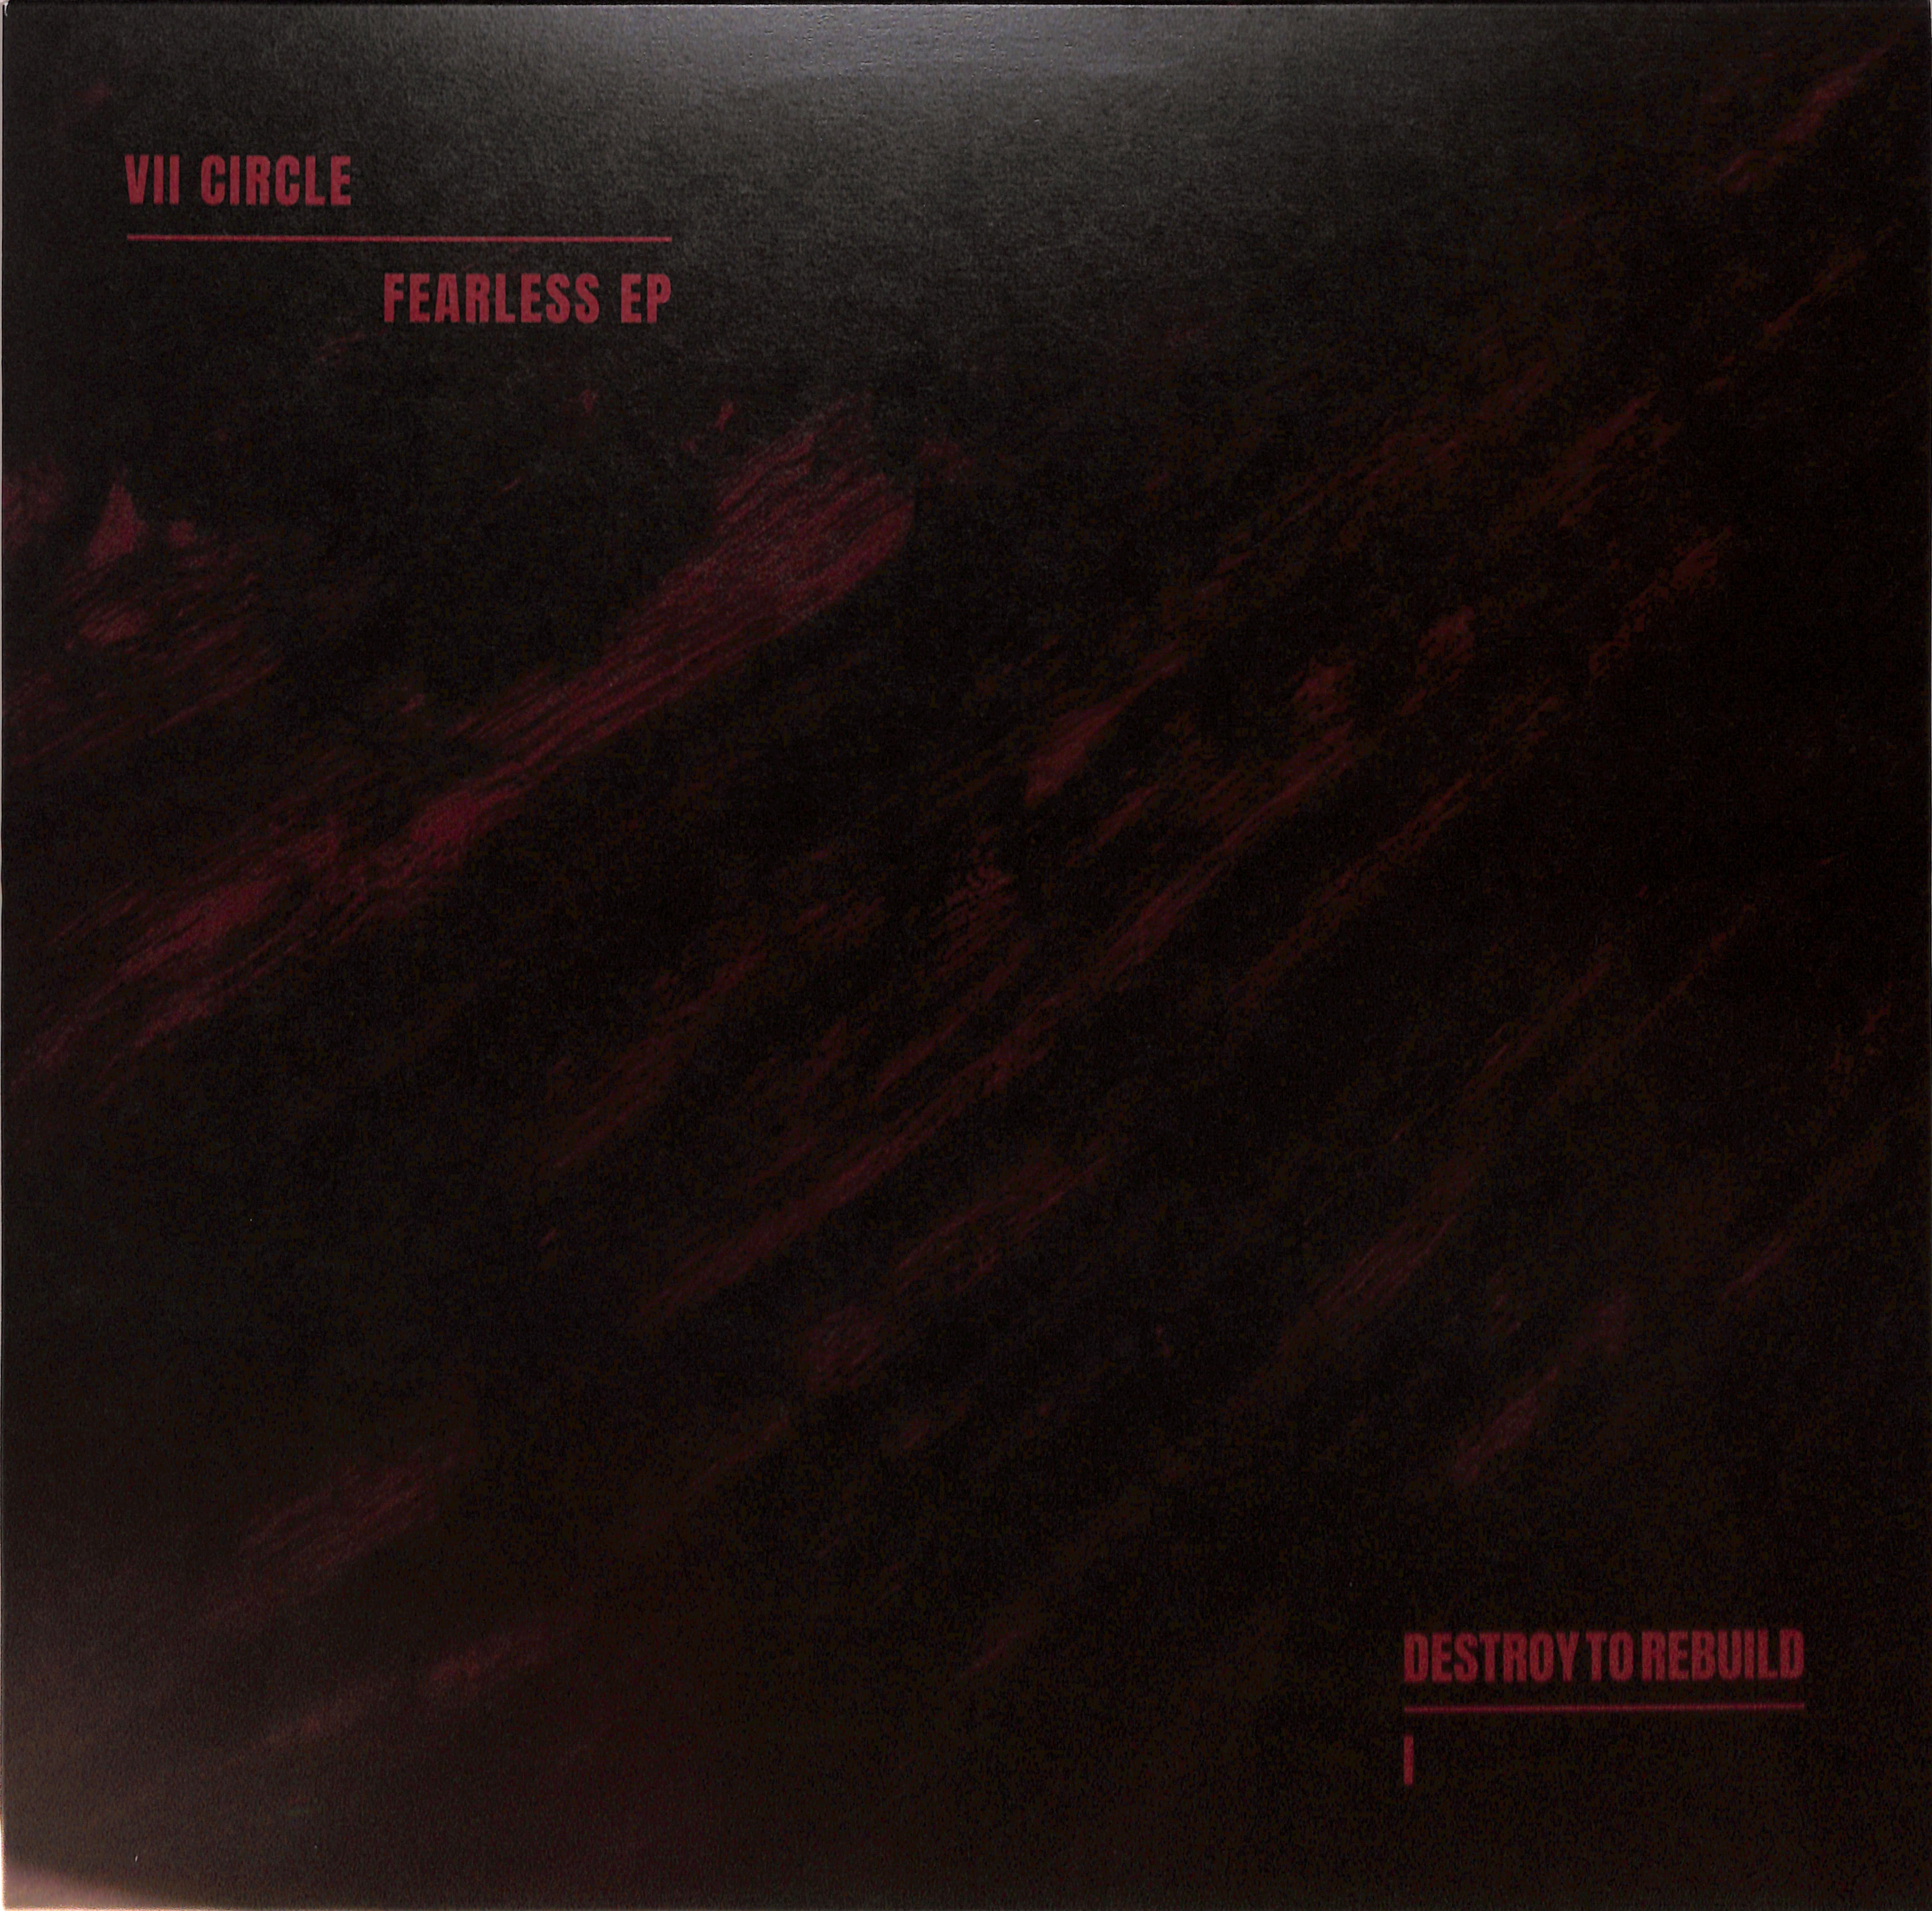 VII Circle - FEARLESS EP